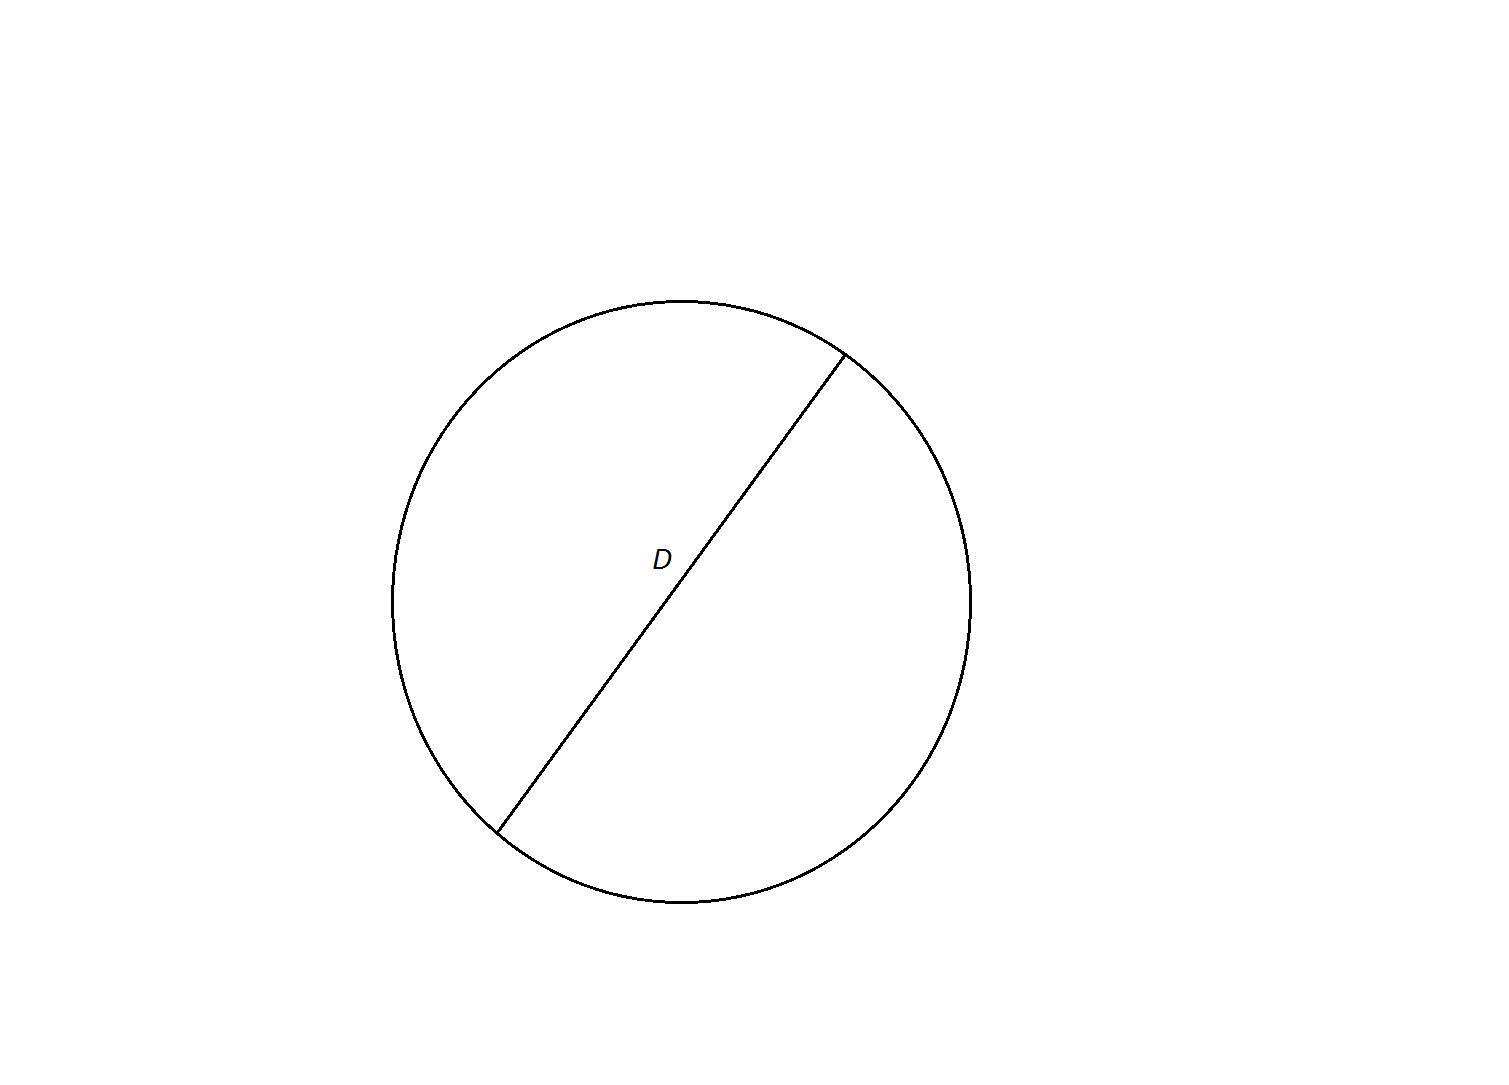 Circle_with_diameter